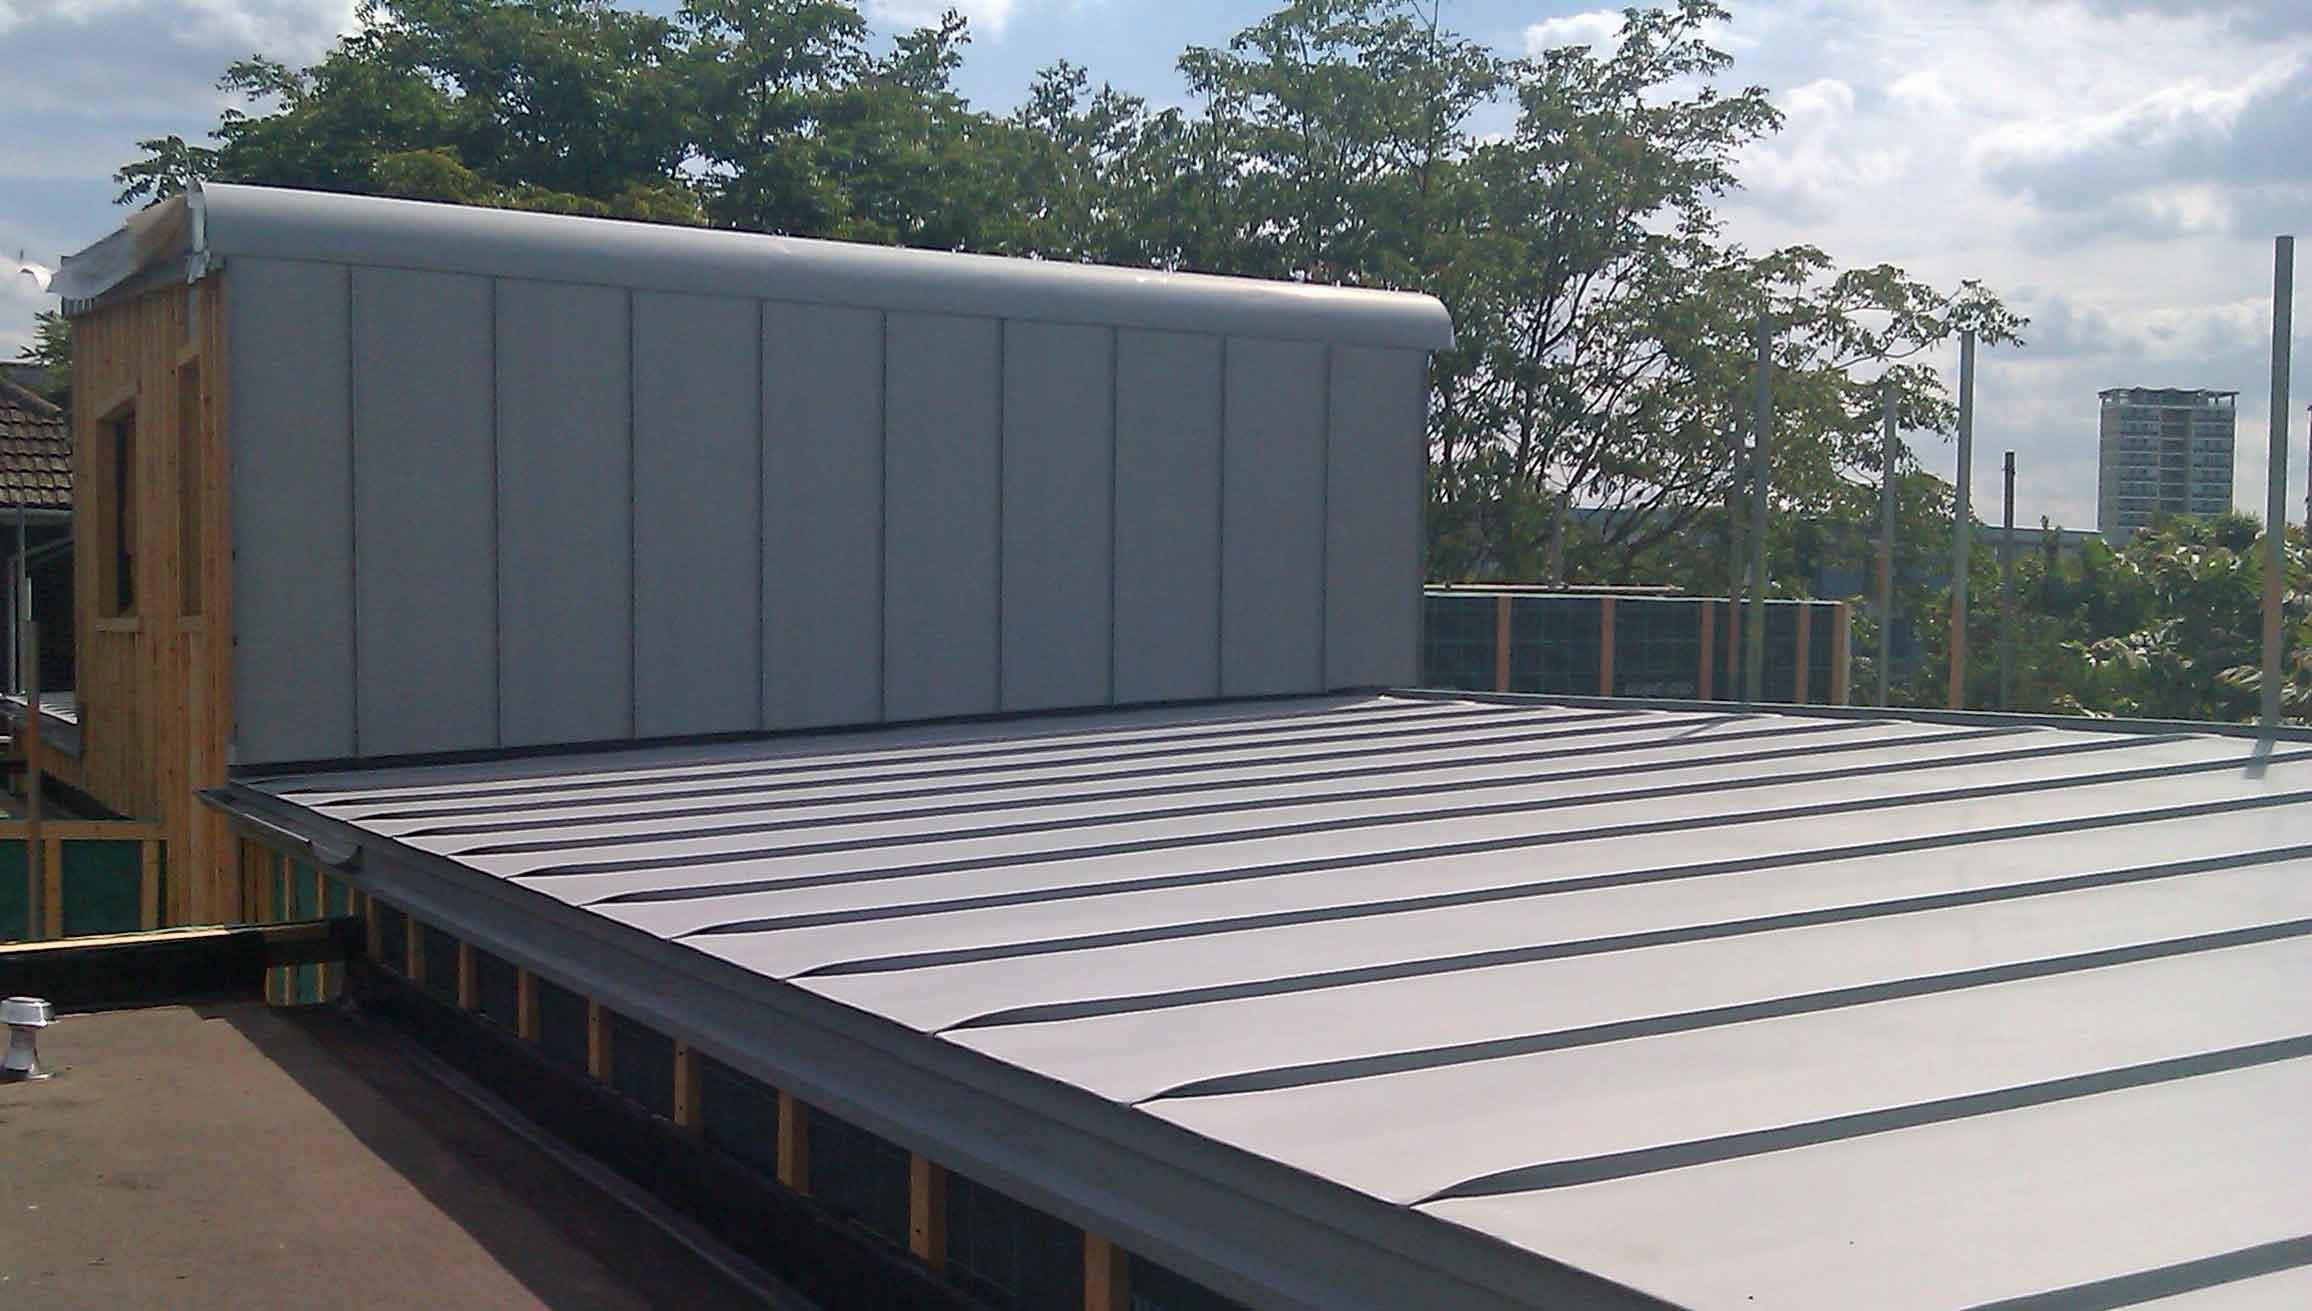 Falzinc roofs for Southwark apartment block - Metal Roof Ltd